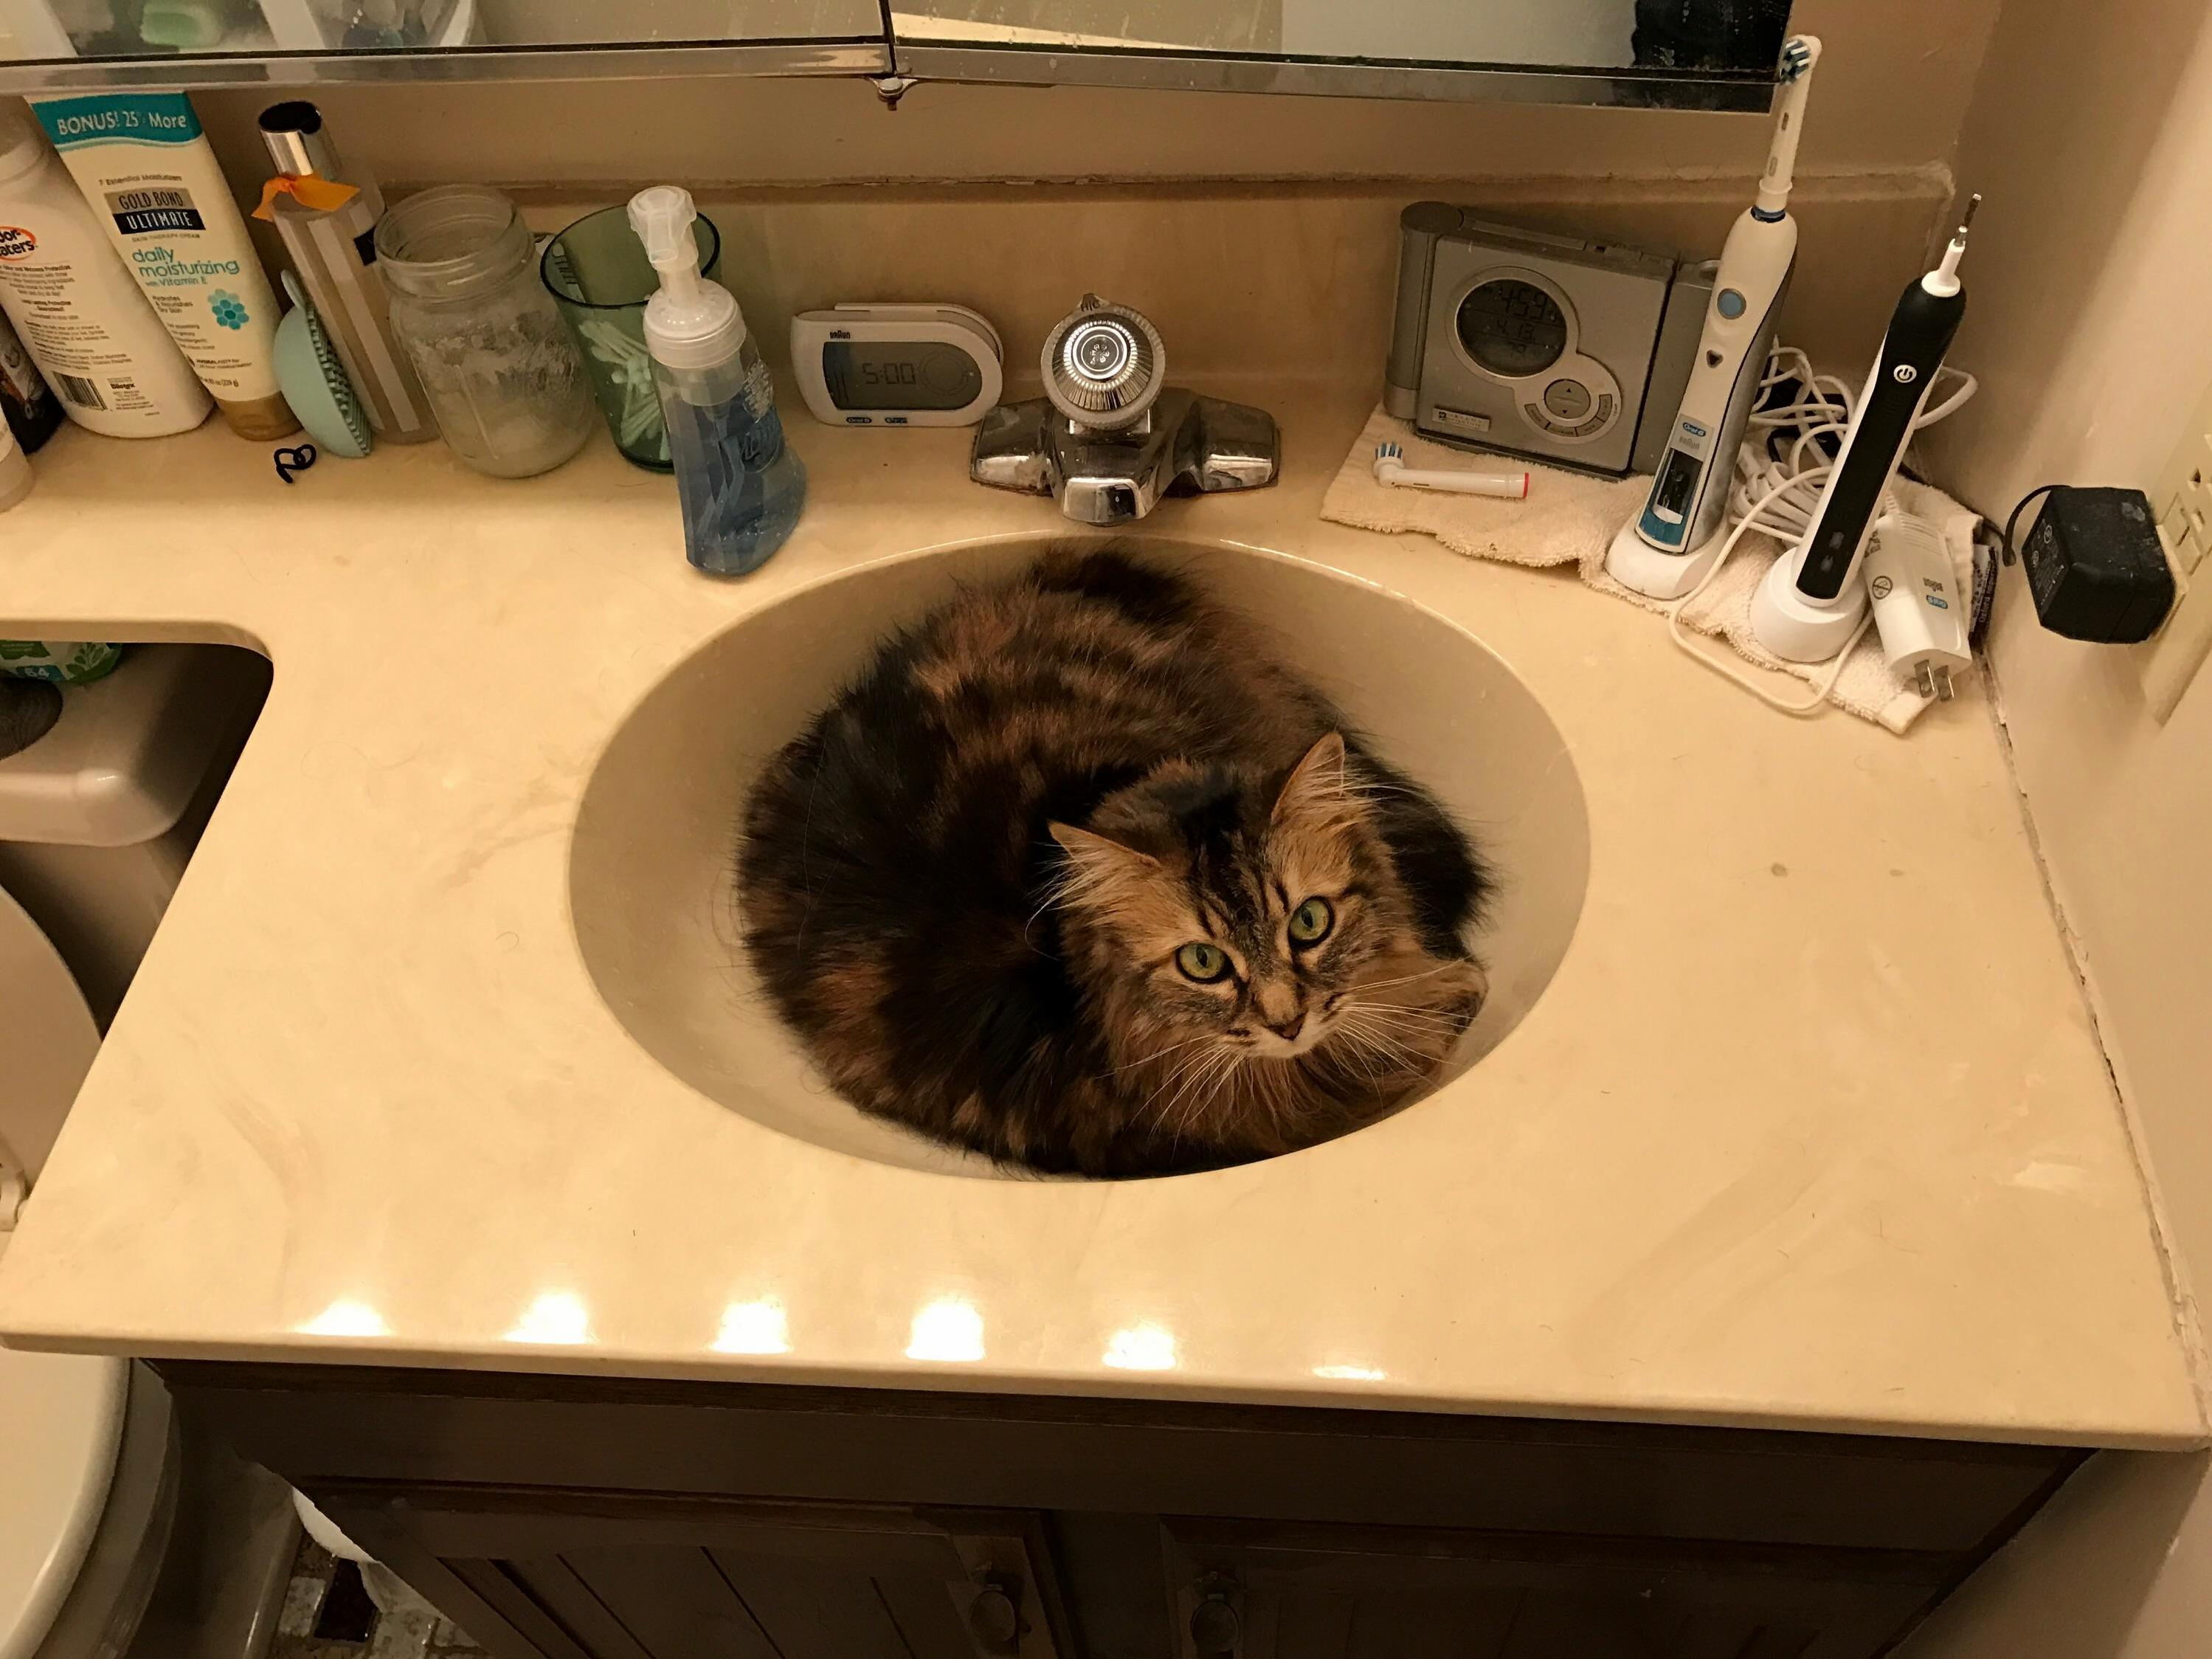 My sink wont drain